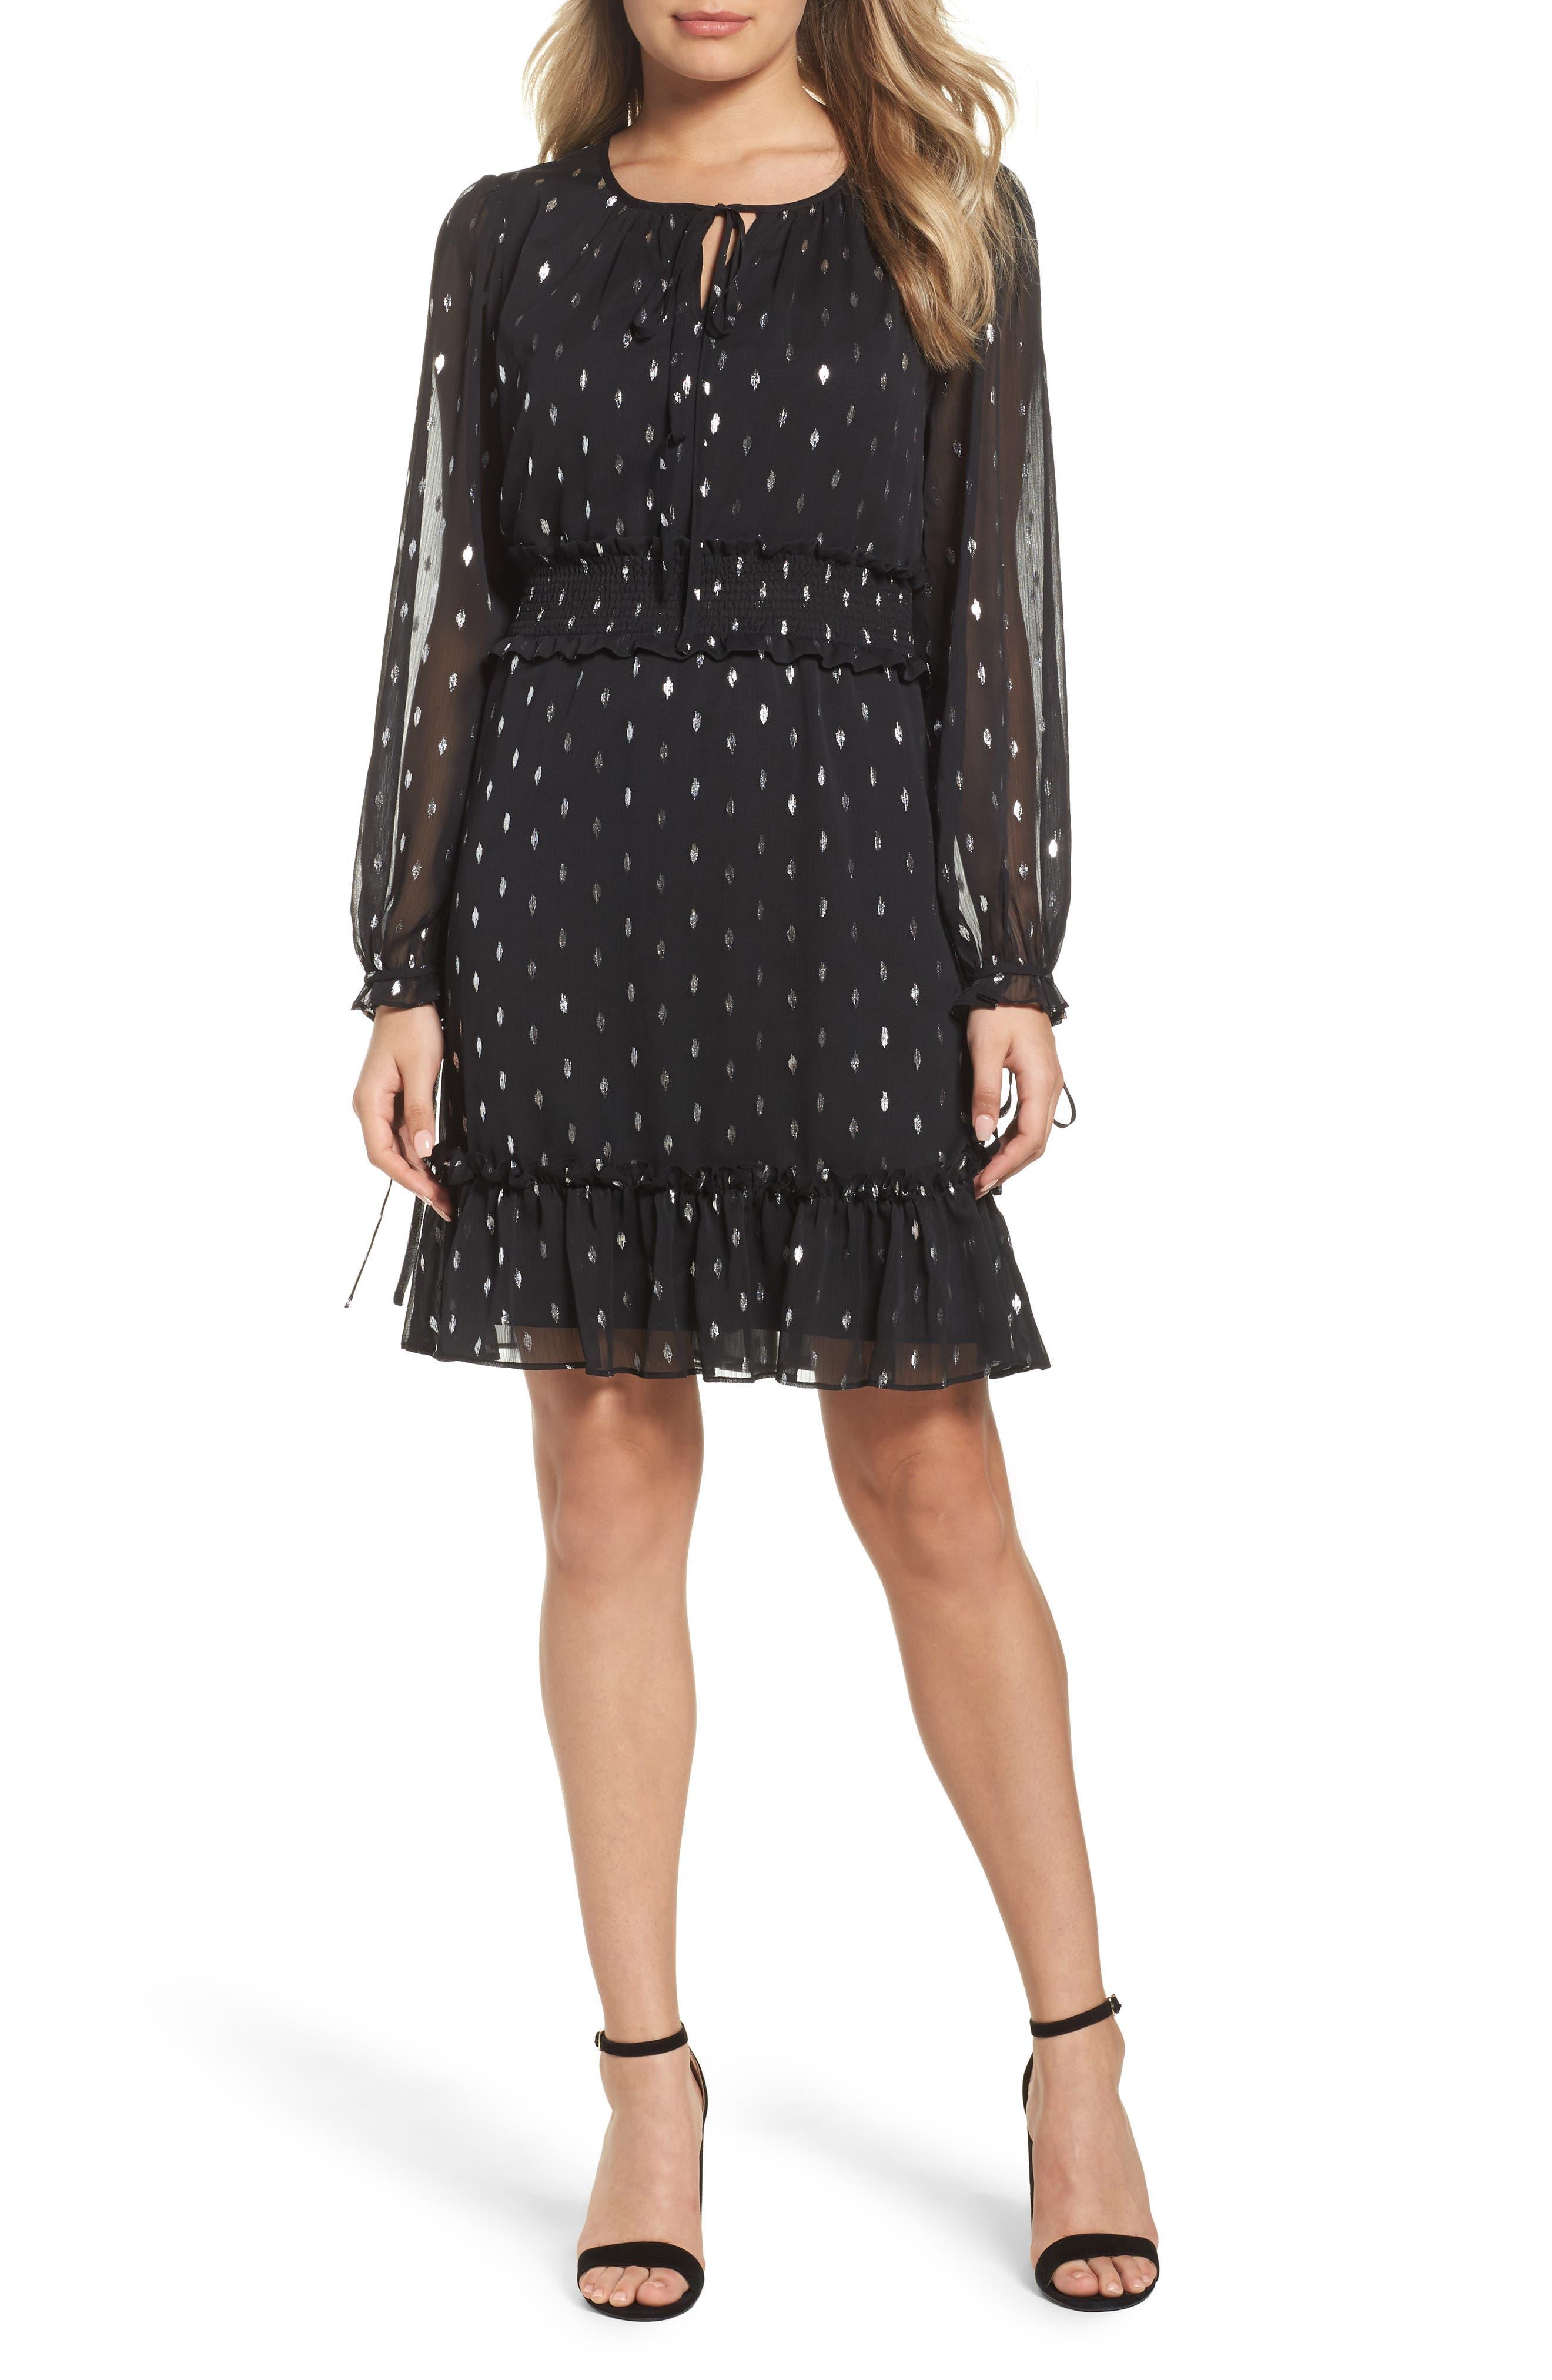 Main Image - Chelsea28 Metallic Smocked Dress